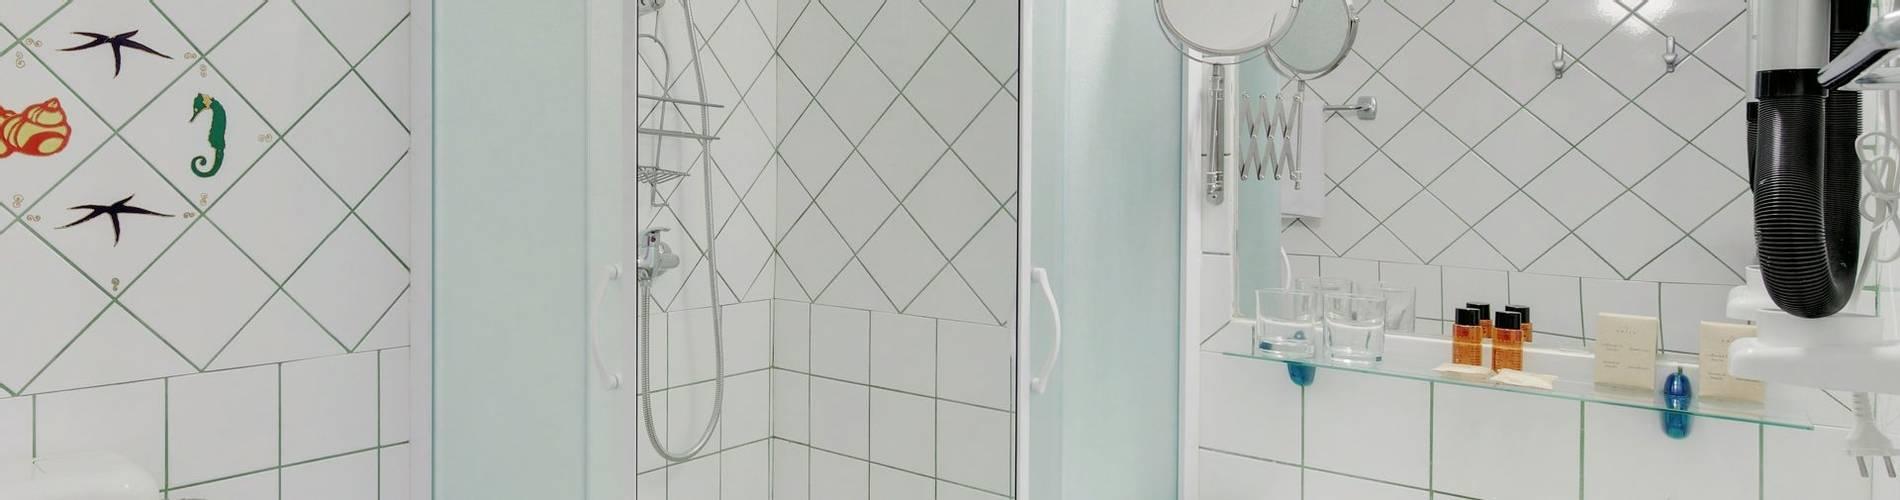 Hotel Villa ADRIATICA 2014 ZStandard Double Bathroom 11MB.jpg